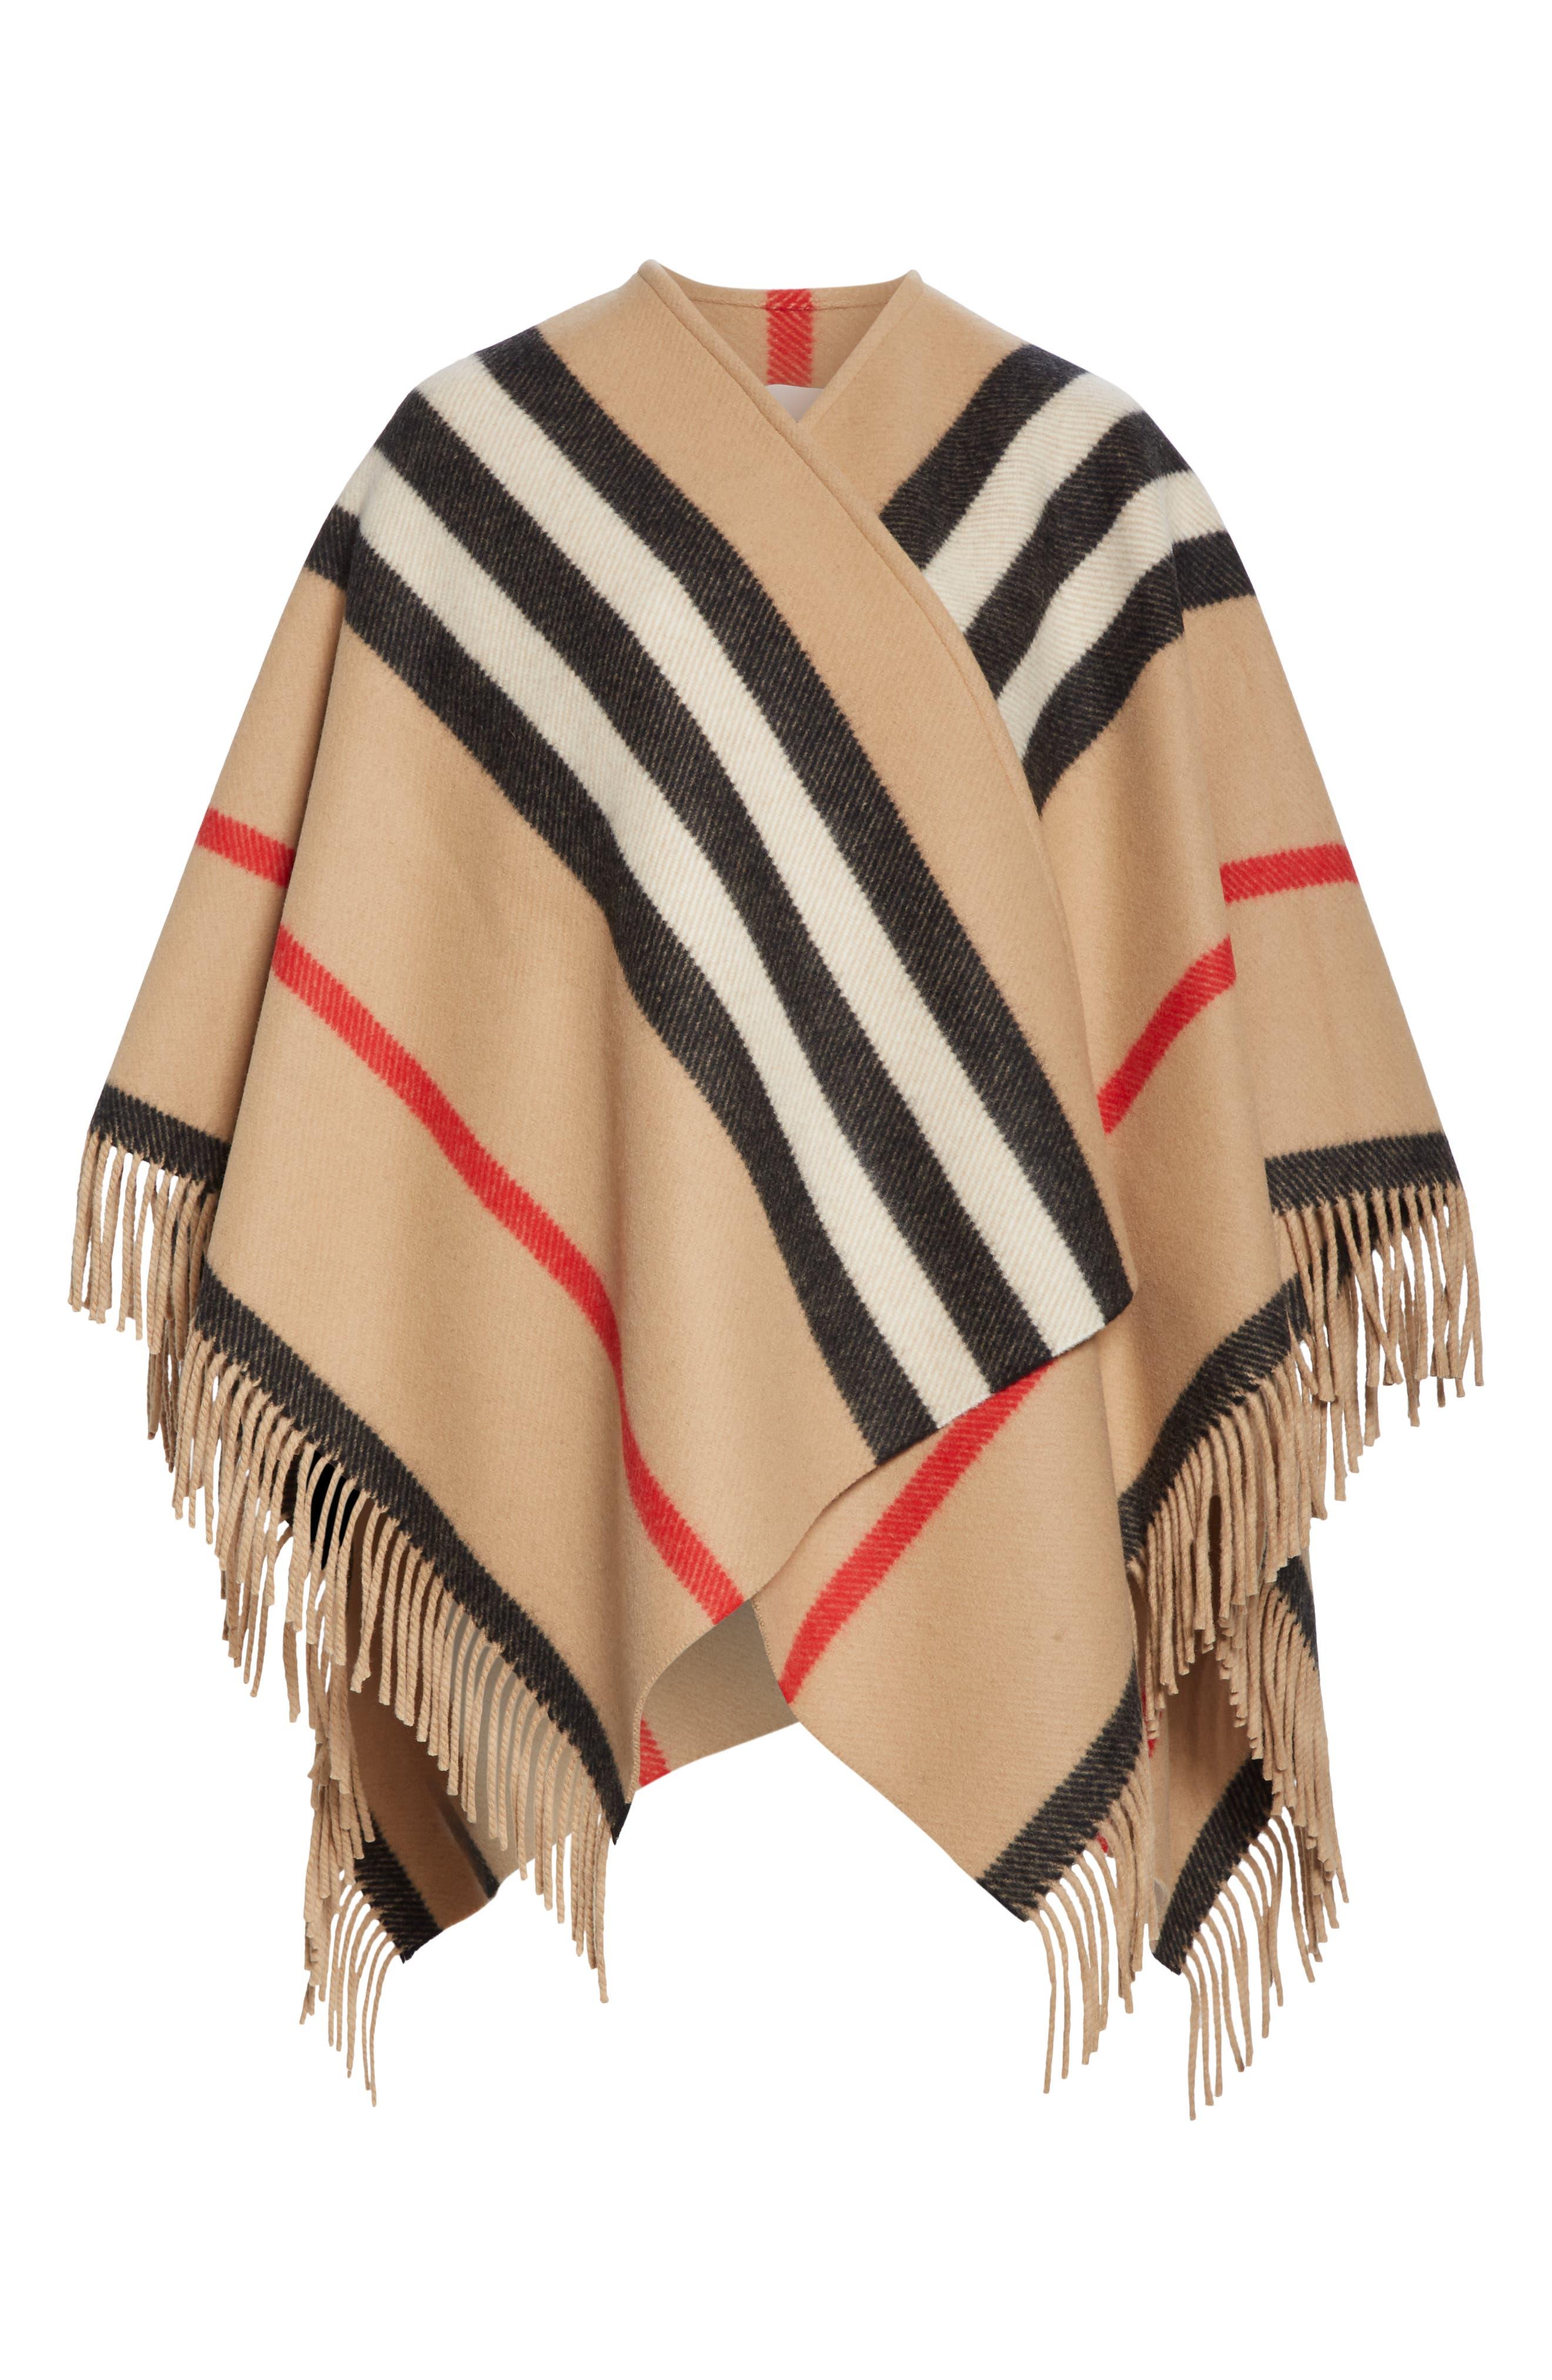 BURBERRY, Stripe Fringe Wool Cape, Alternate thumbnail 6, color, CAMEL